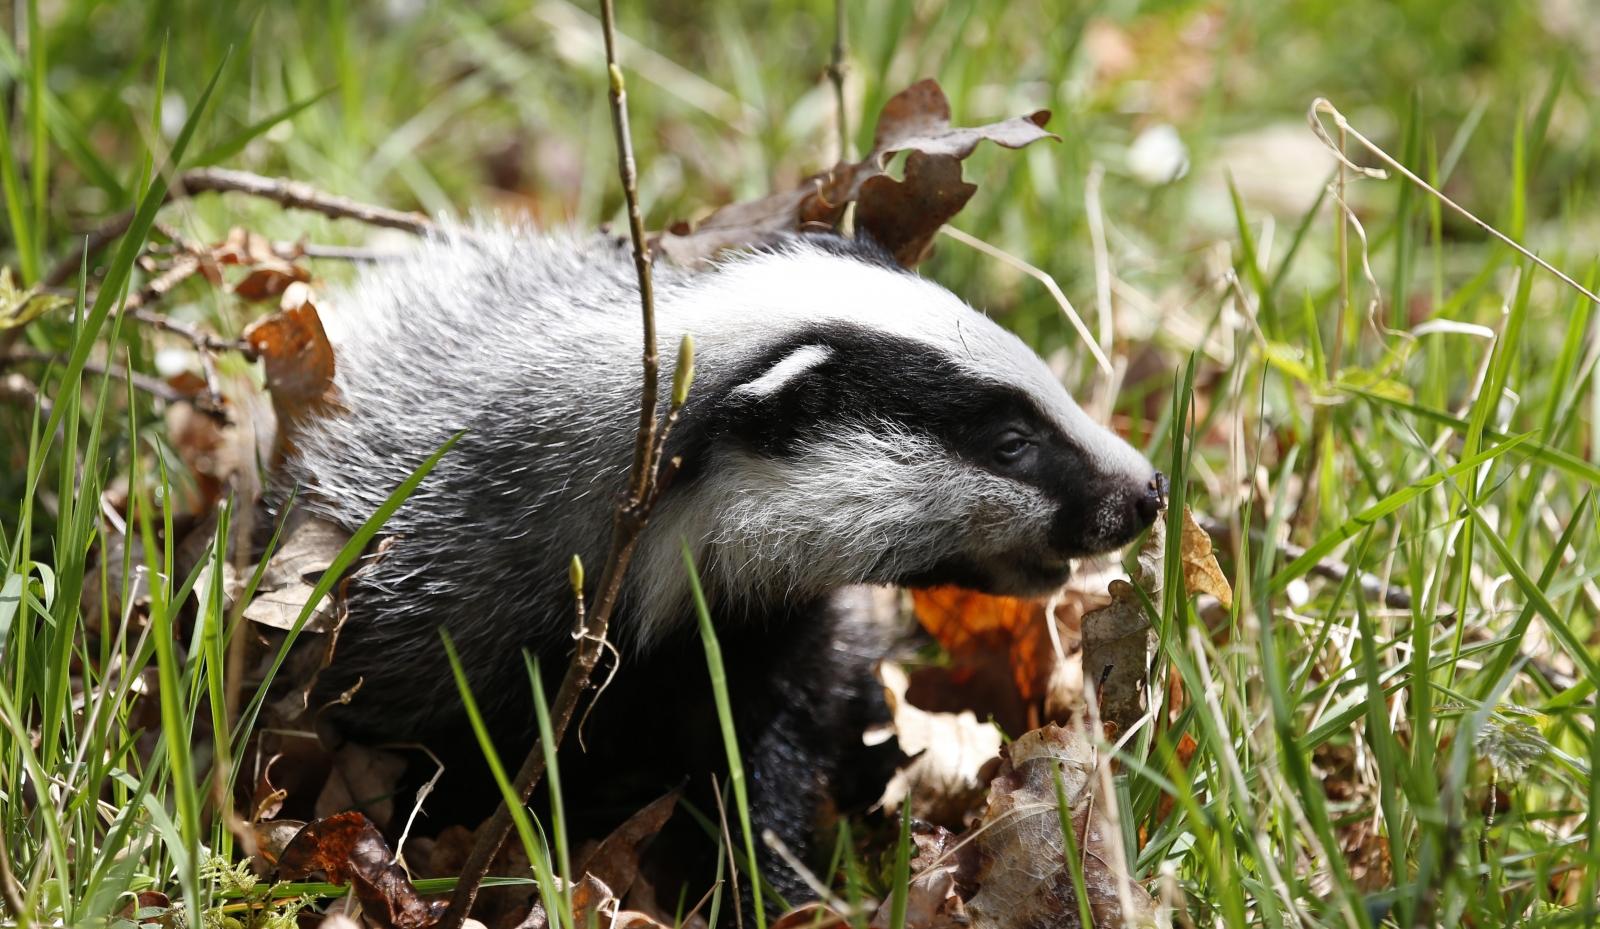 Badger in Scotland